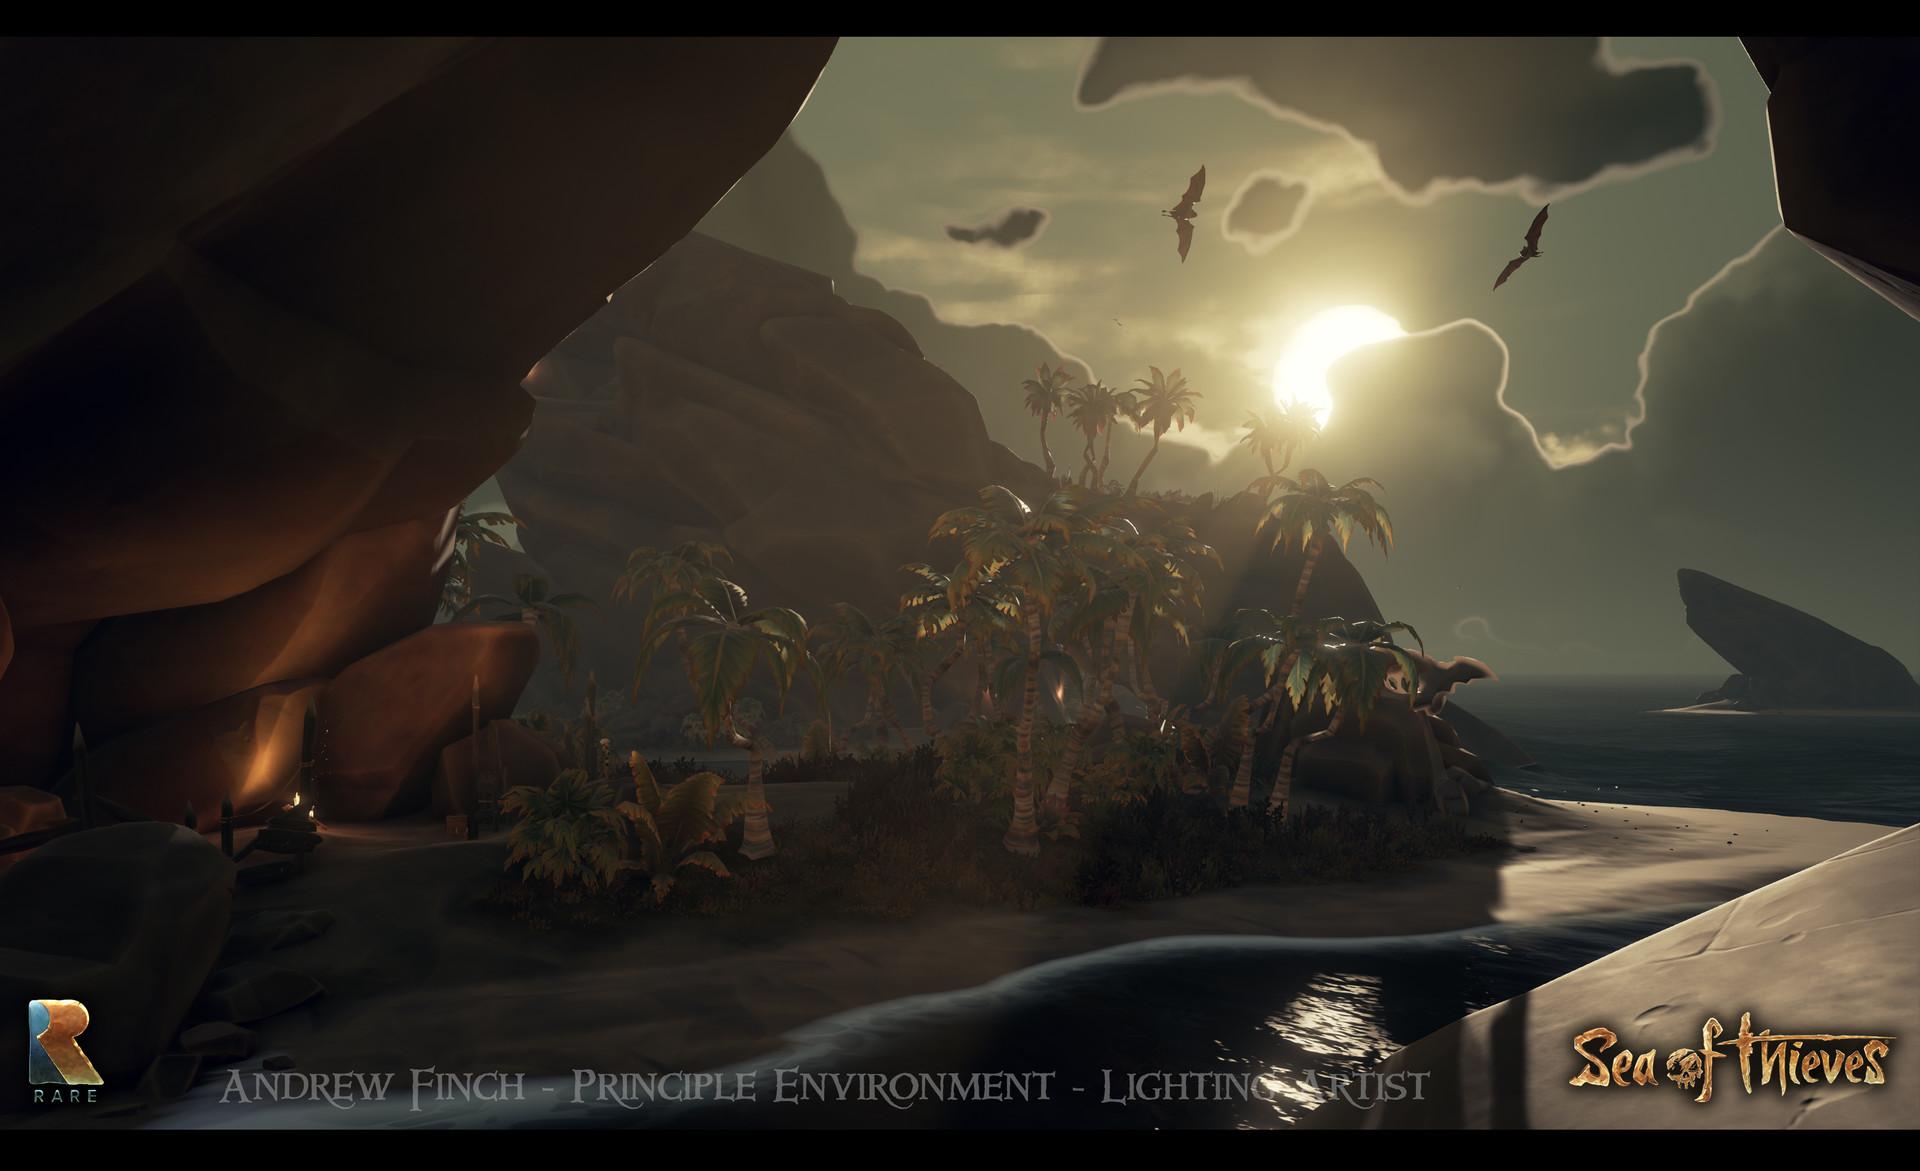 Andrew finch island lighting 40